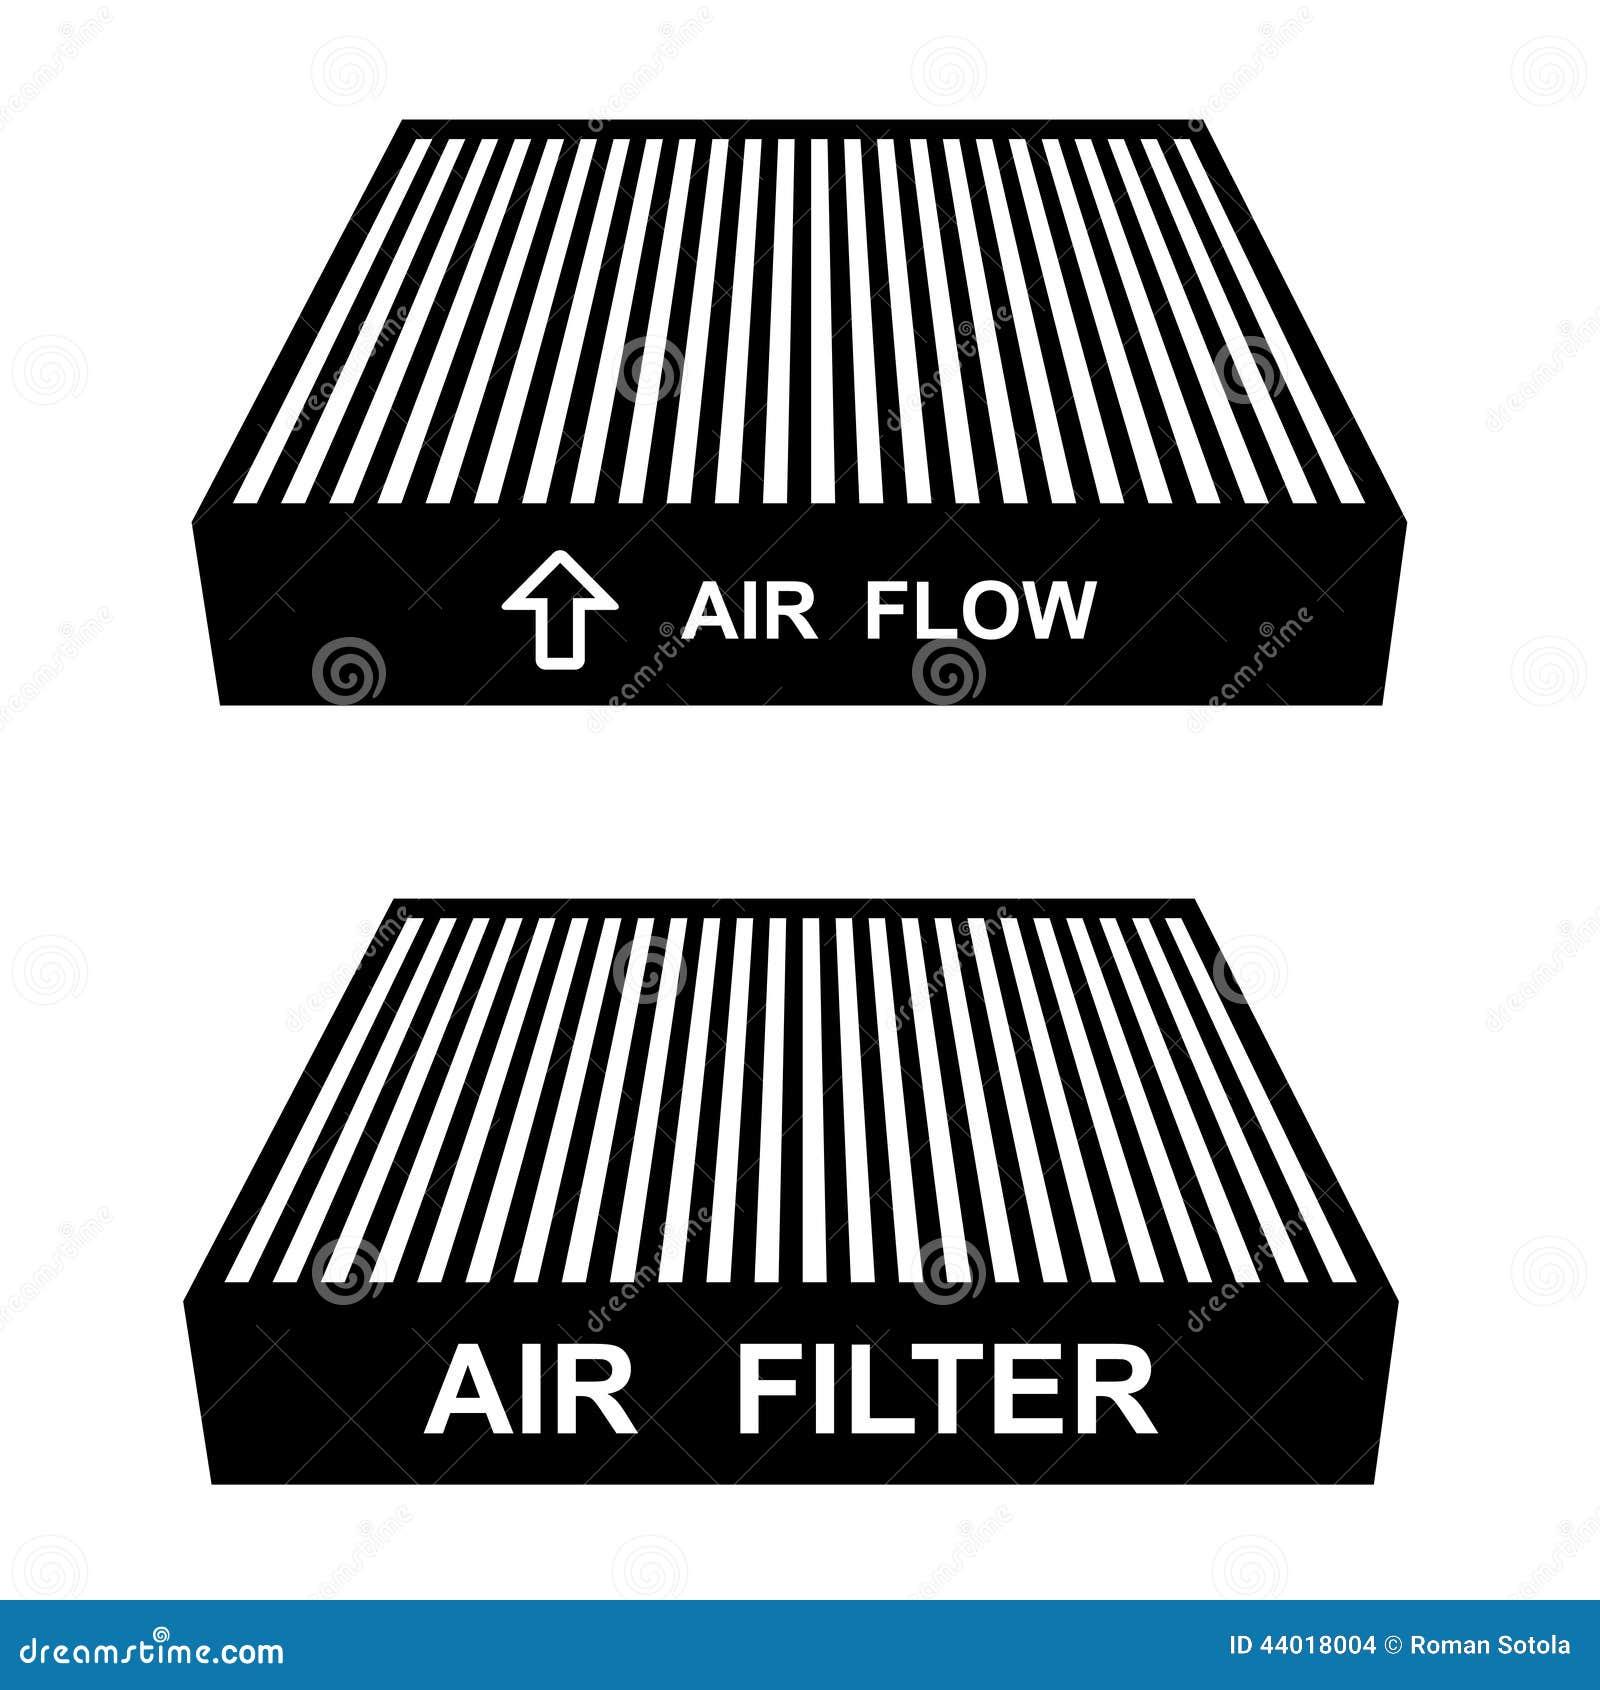 Air Filter Symbols Stock Vector Illustration Of Element 44018004